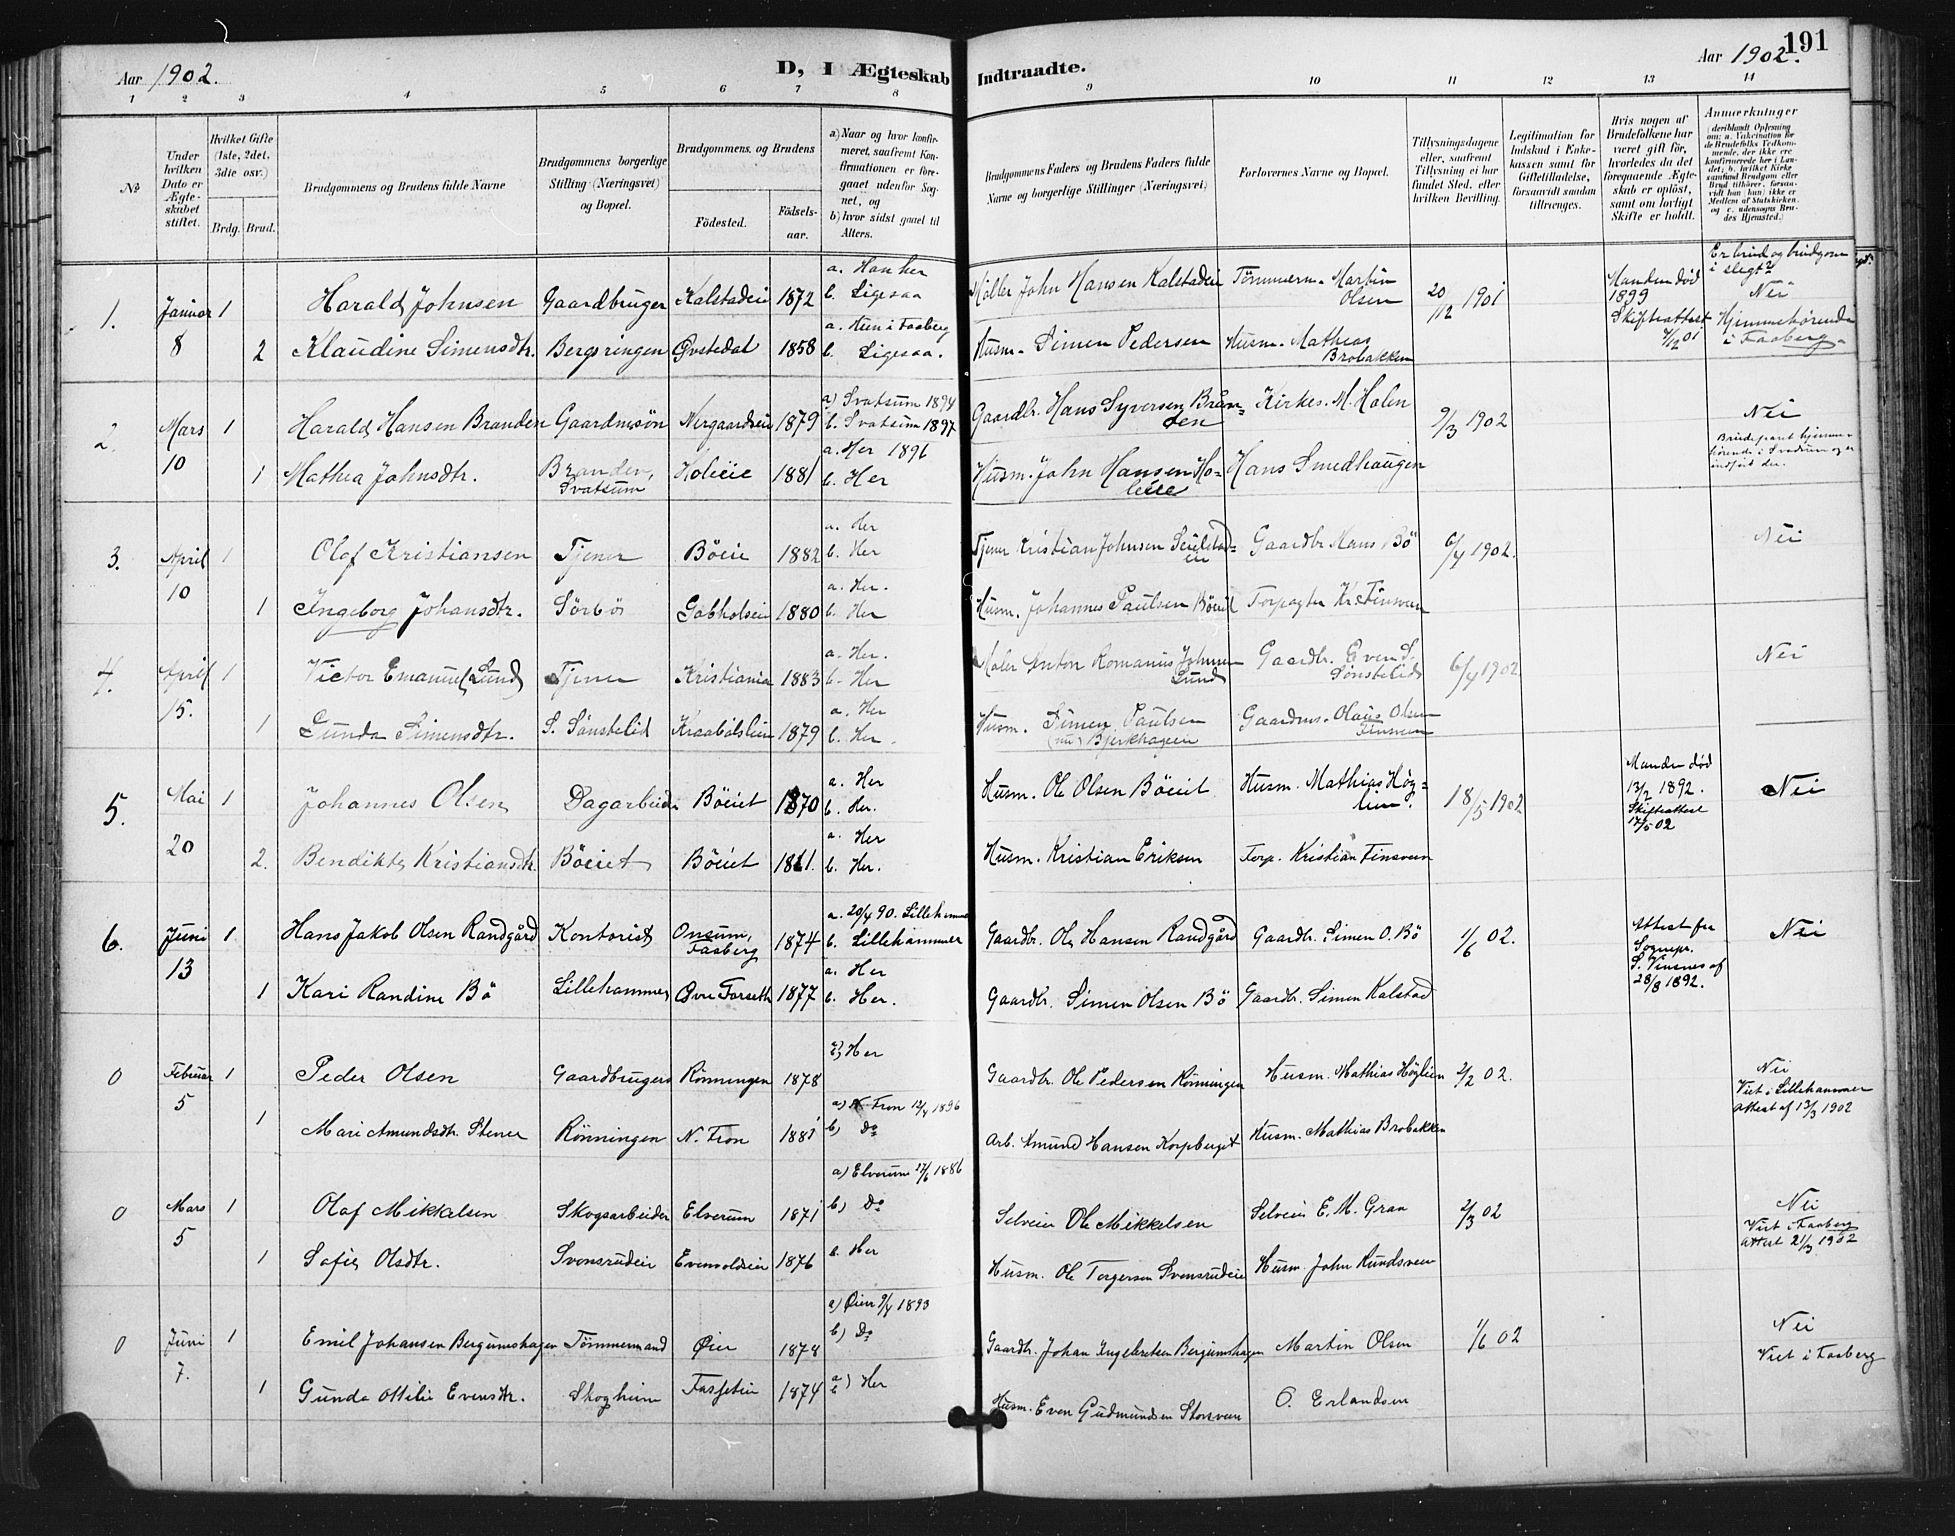 SAH, Vestre Gausdal prestekontor, Klokkerbok nr. 3, 1896-1925, s. 191